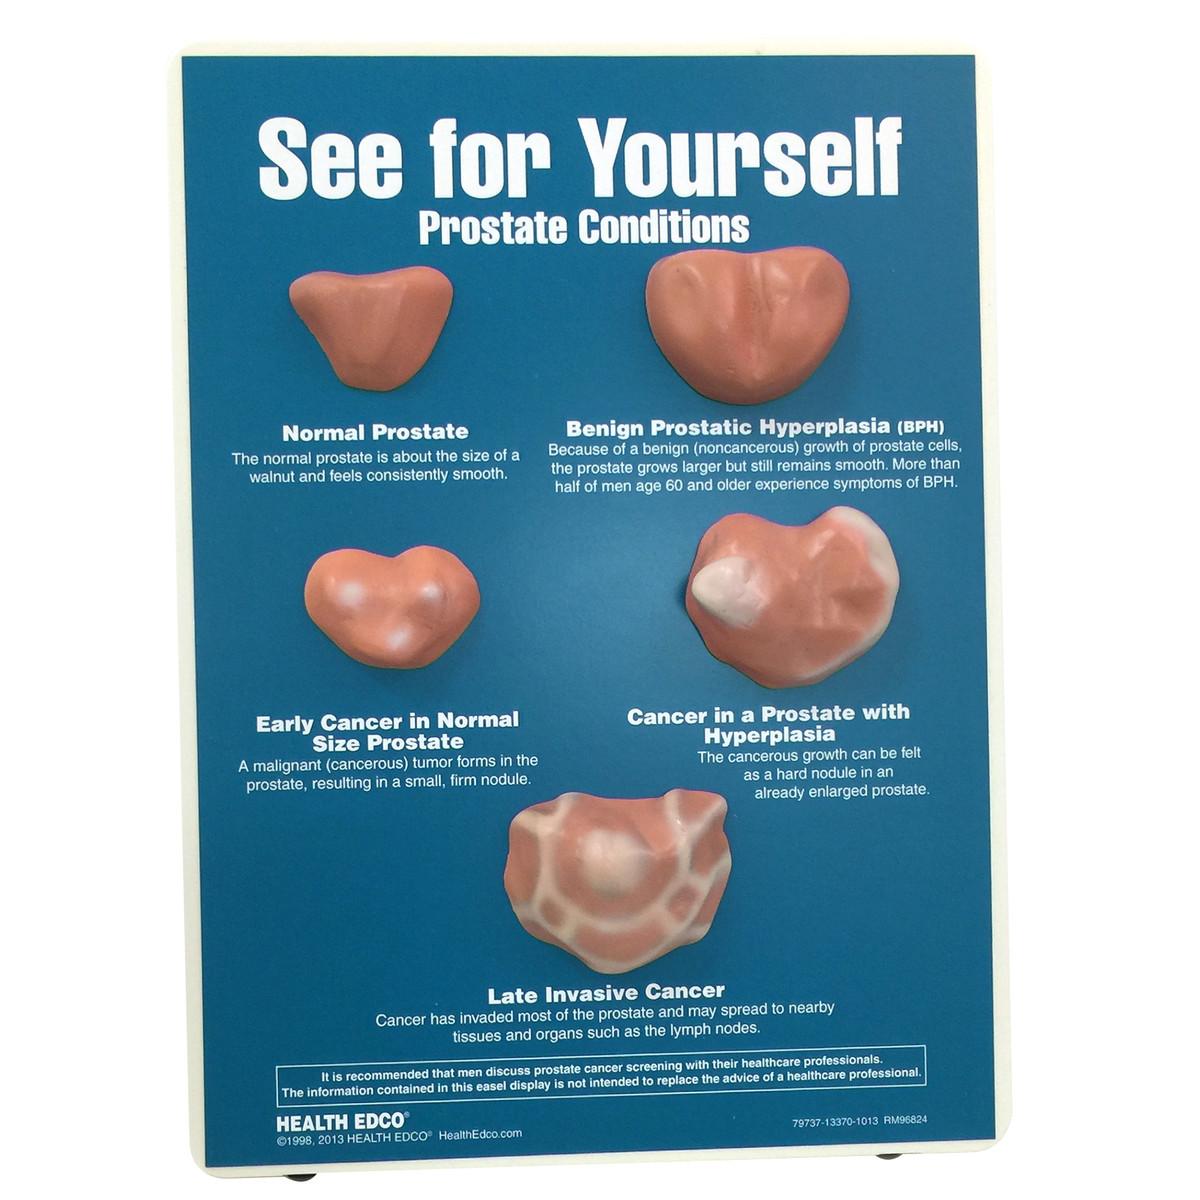 Health Edco; prostate exam; PSA; prostate cancer;